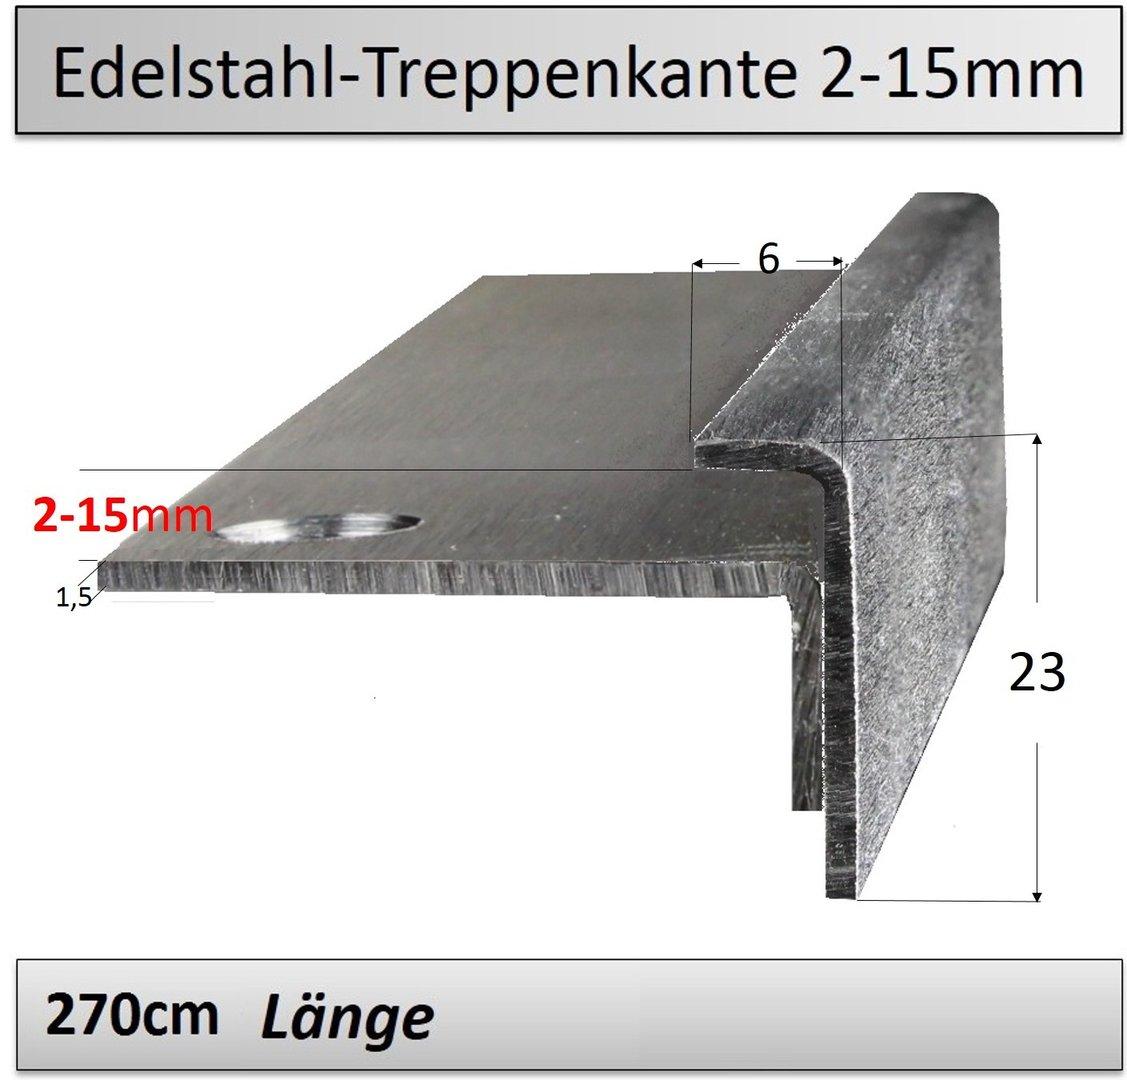 Treppenkantenprofil Fliesen: 2-15mm Edelstahl-Treppenkantenprofil TOP Preis/ Qualität